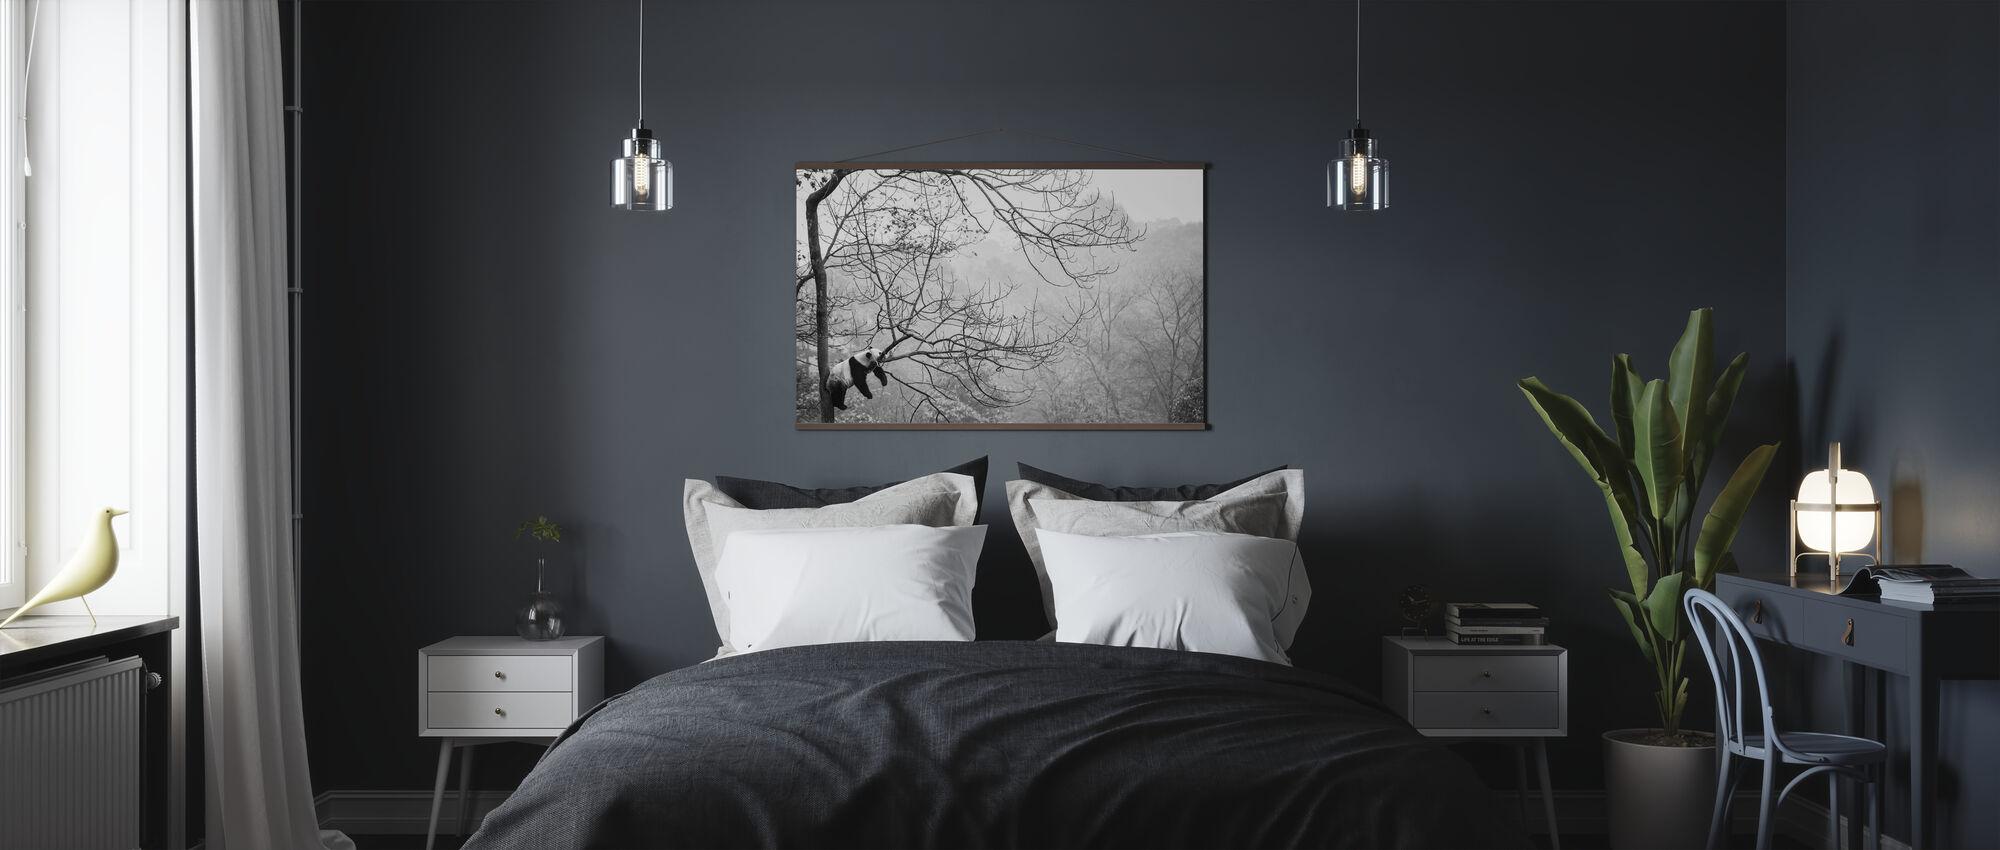 Rentoudu - Juliste - Makuuhuone